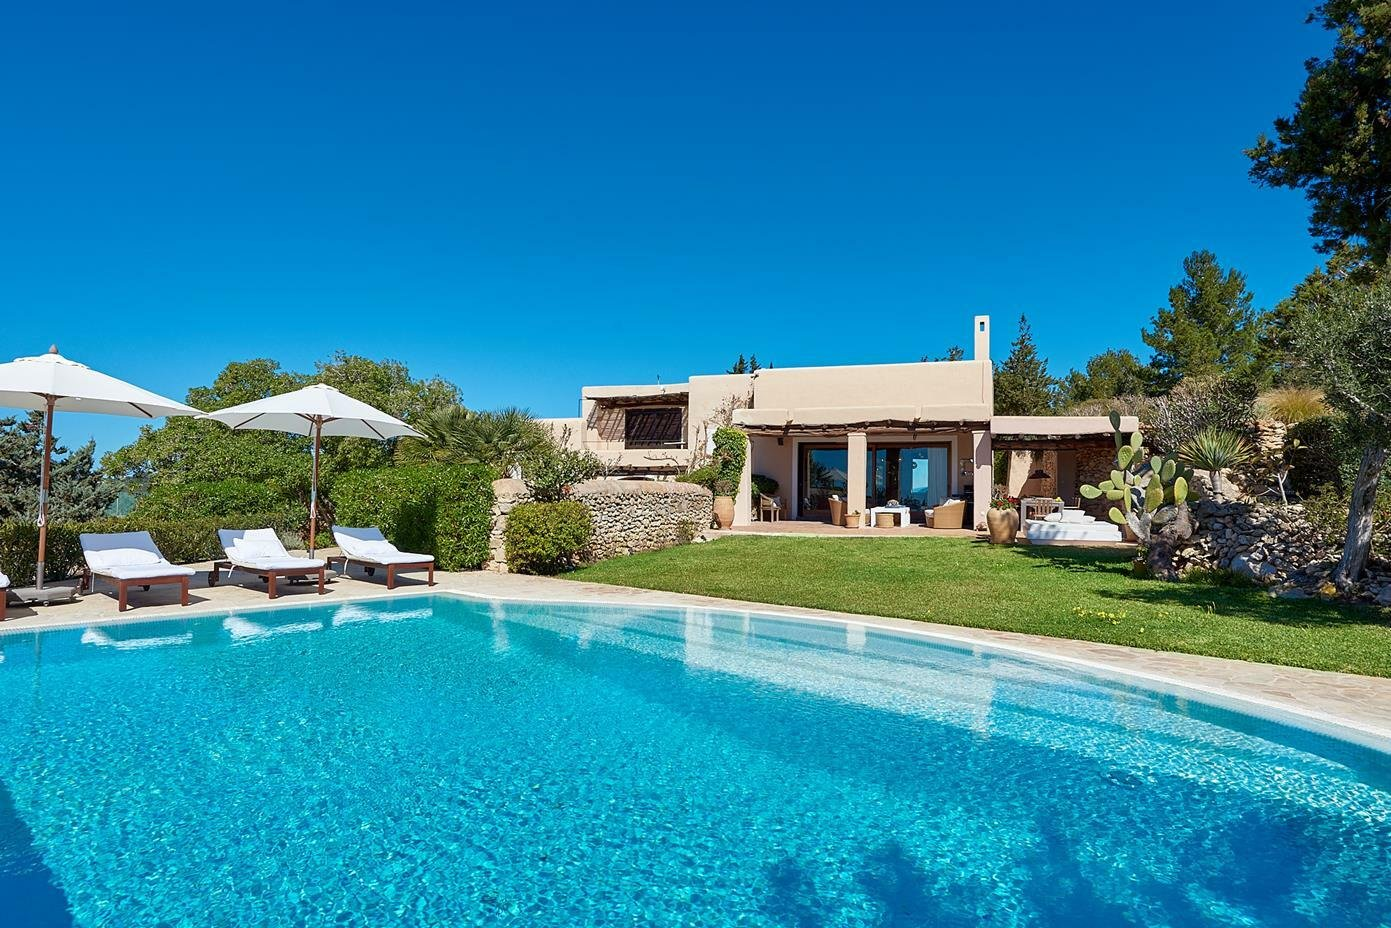 House in Sant Josep de sa Talaia, Balearic Islands, Spain 1 - 11645638